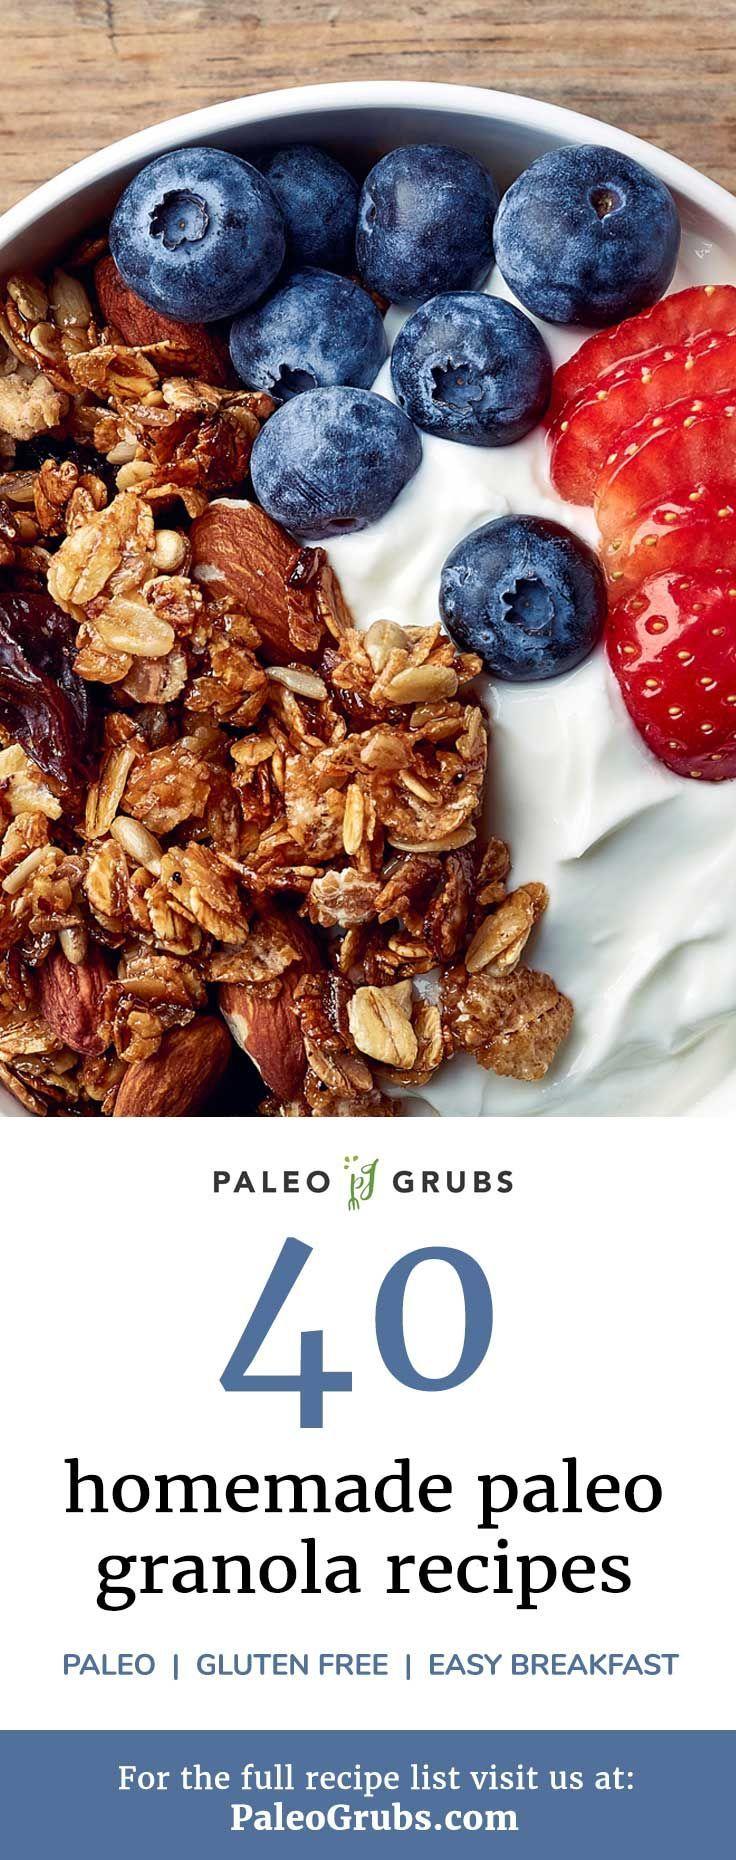 40 Homemade Paleo Granola Recipes for an Easy Breakfast